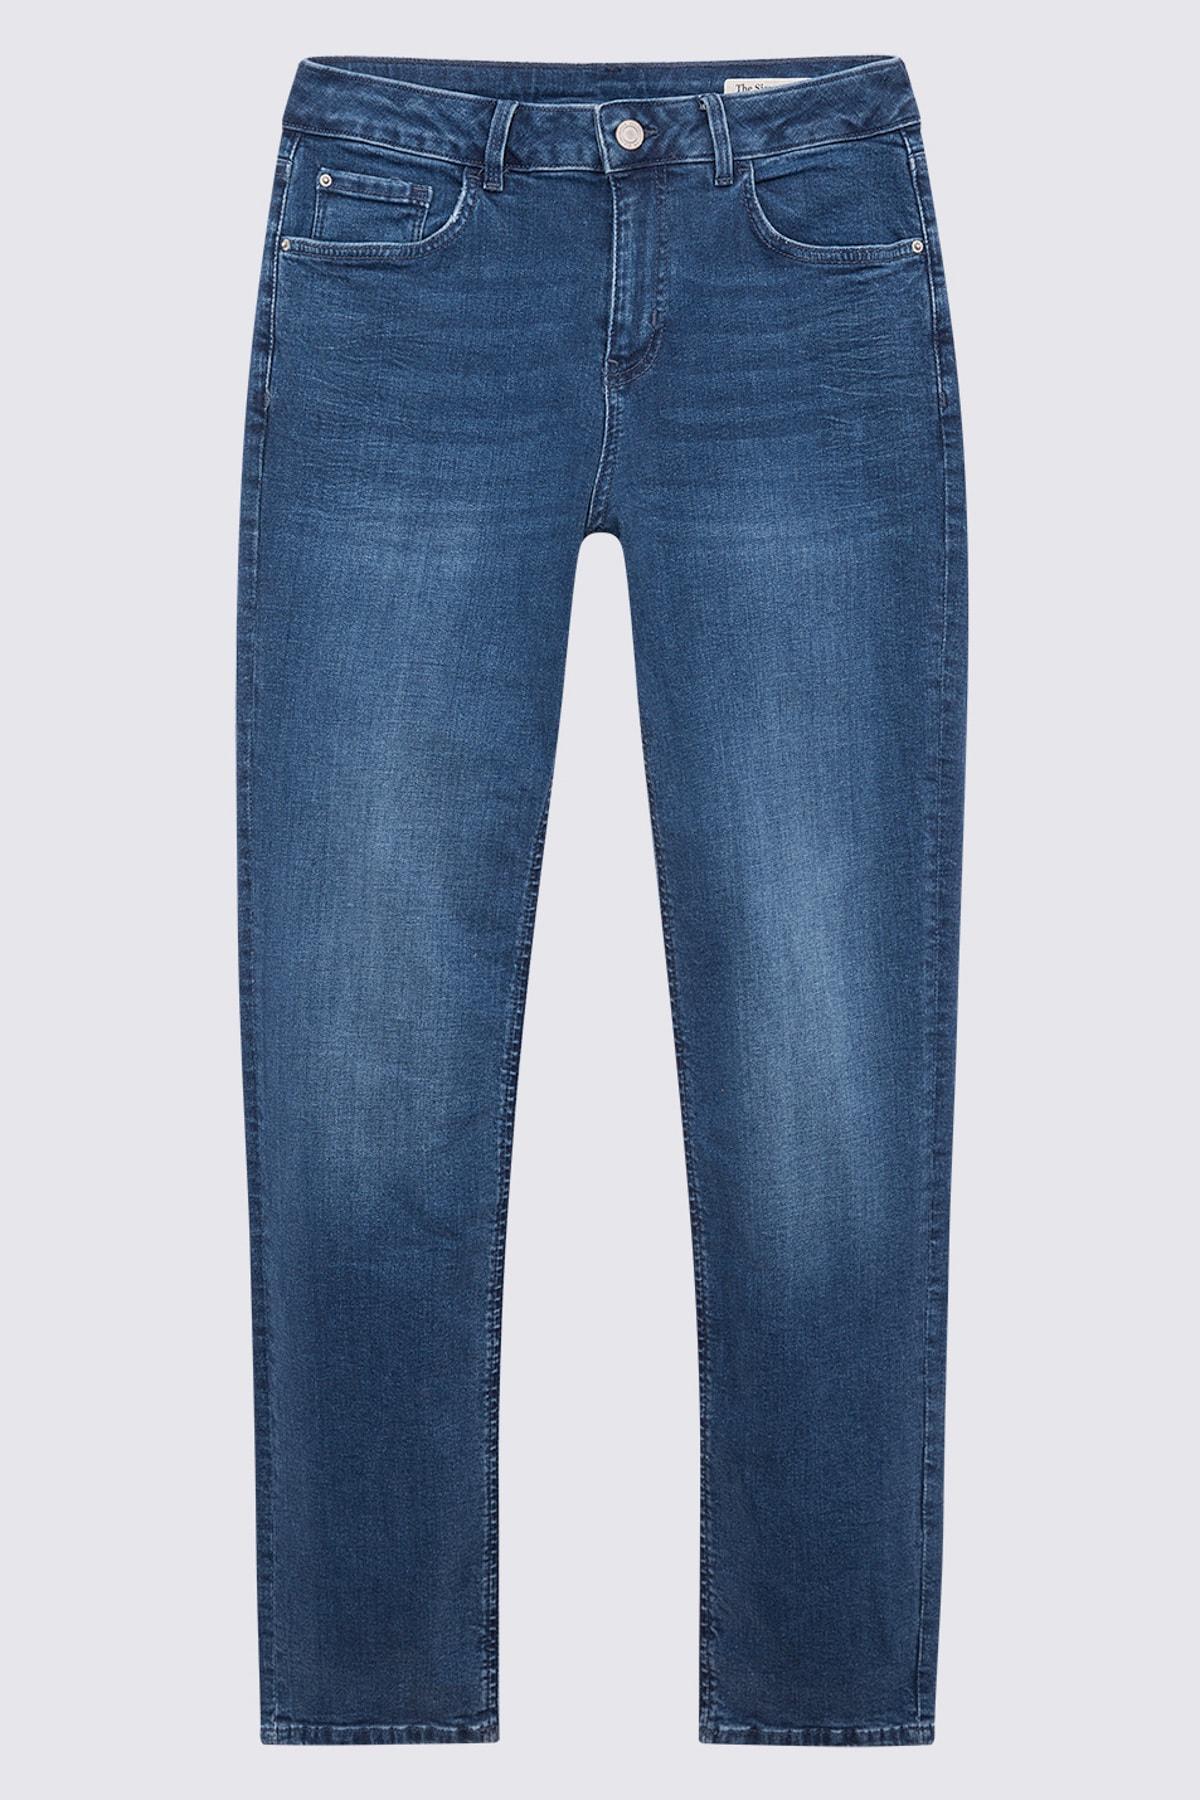 Marks & Spencer Kadın Mavi Straight Fit Pantolon T57007570H 1